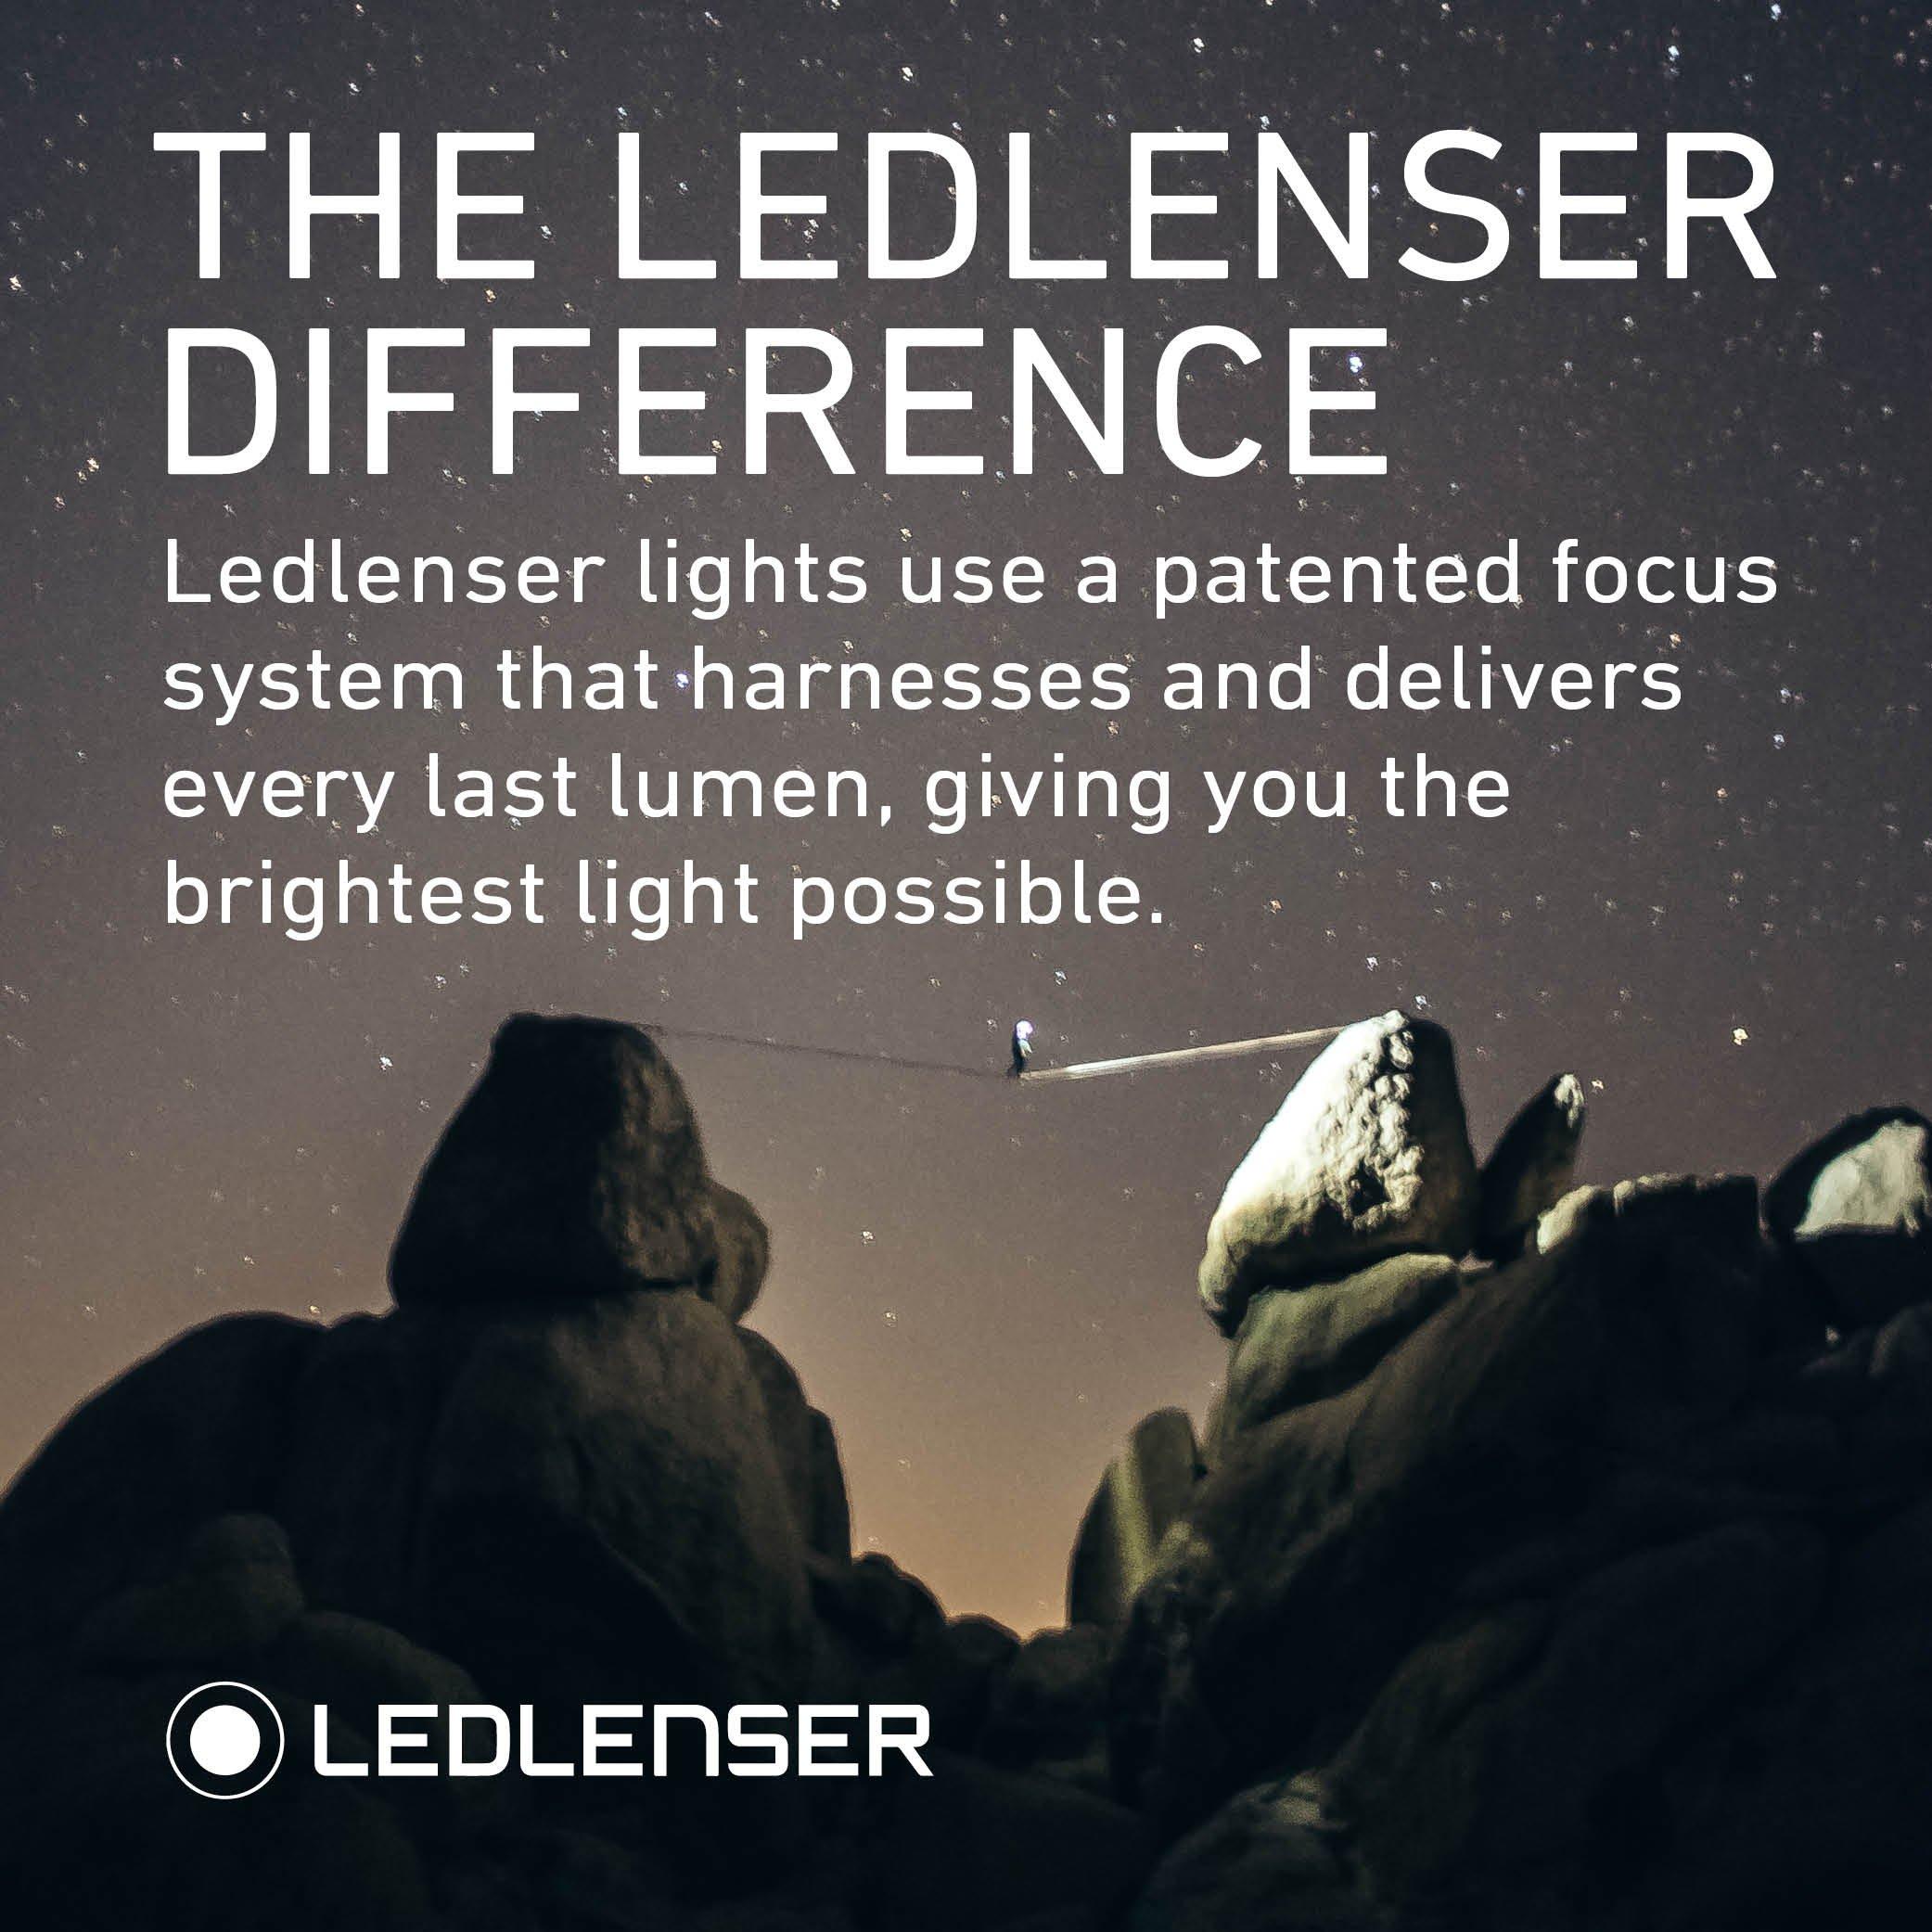 Led Lenser - 3000 Lumens, MT18 Flashlight with Rapid Focus System by LED Lenser (Image #8)